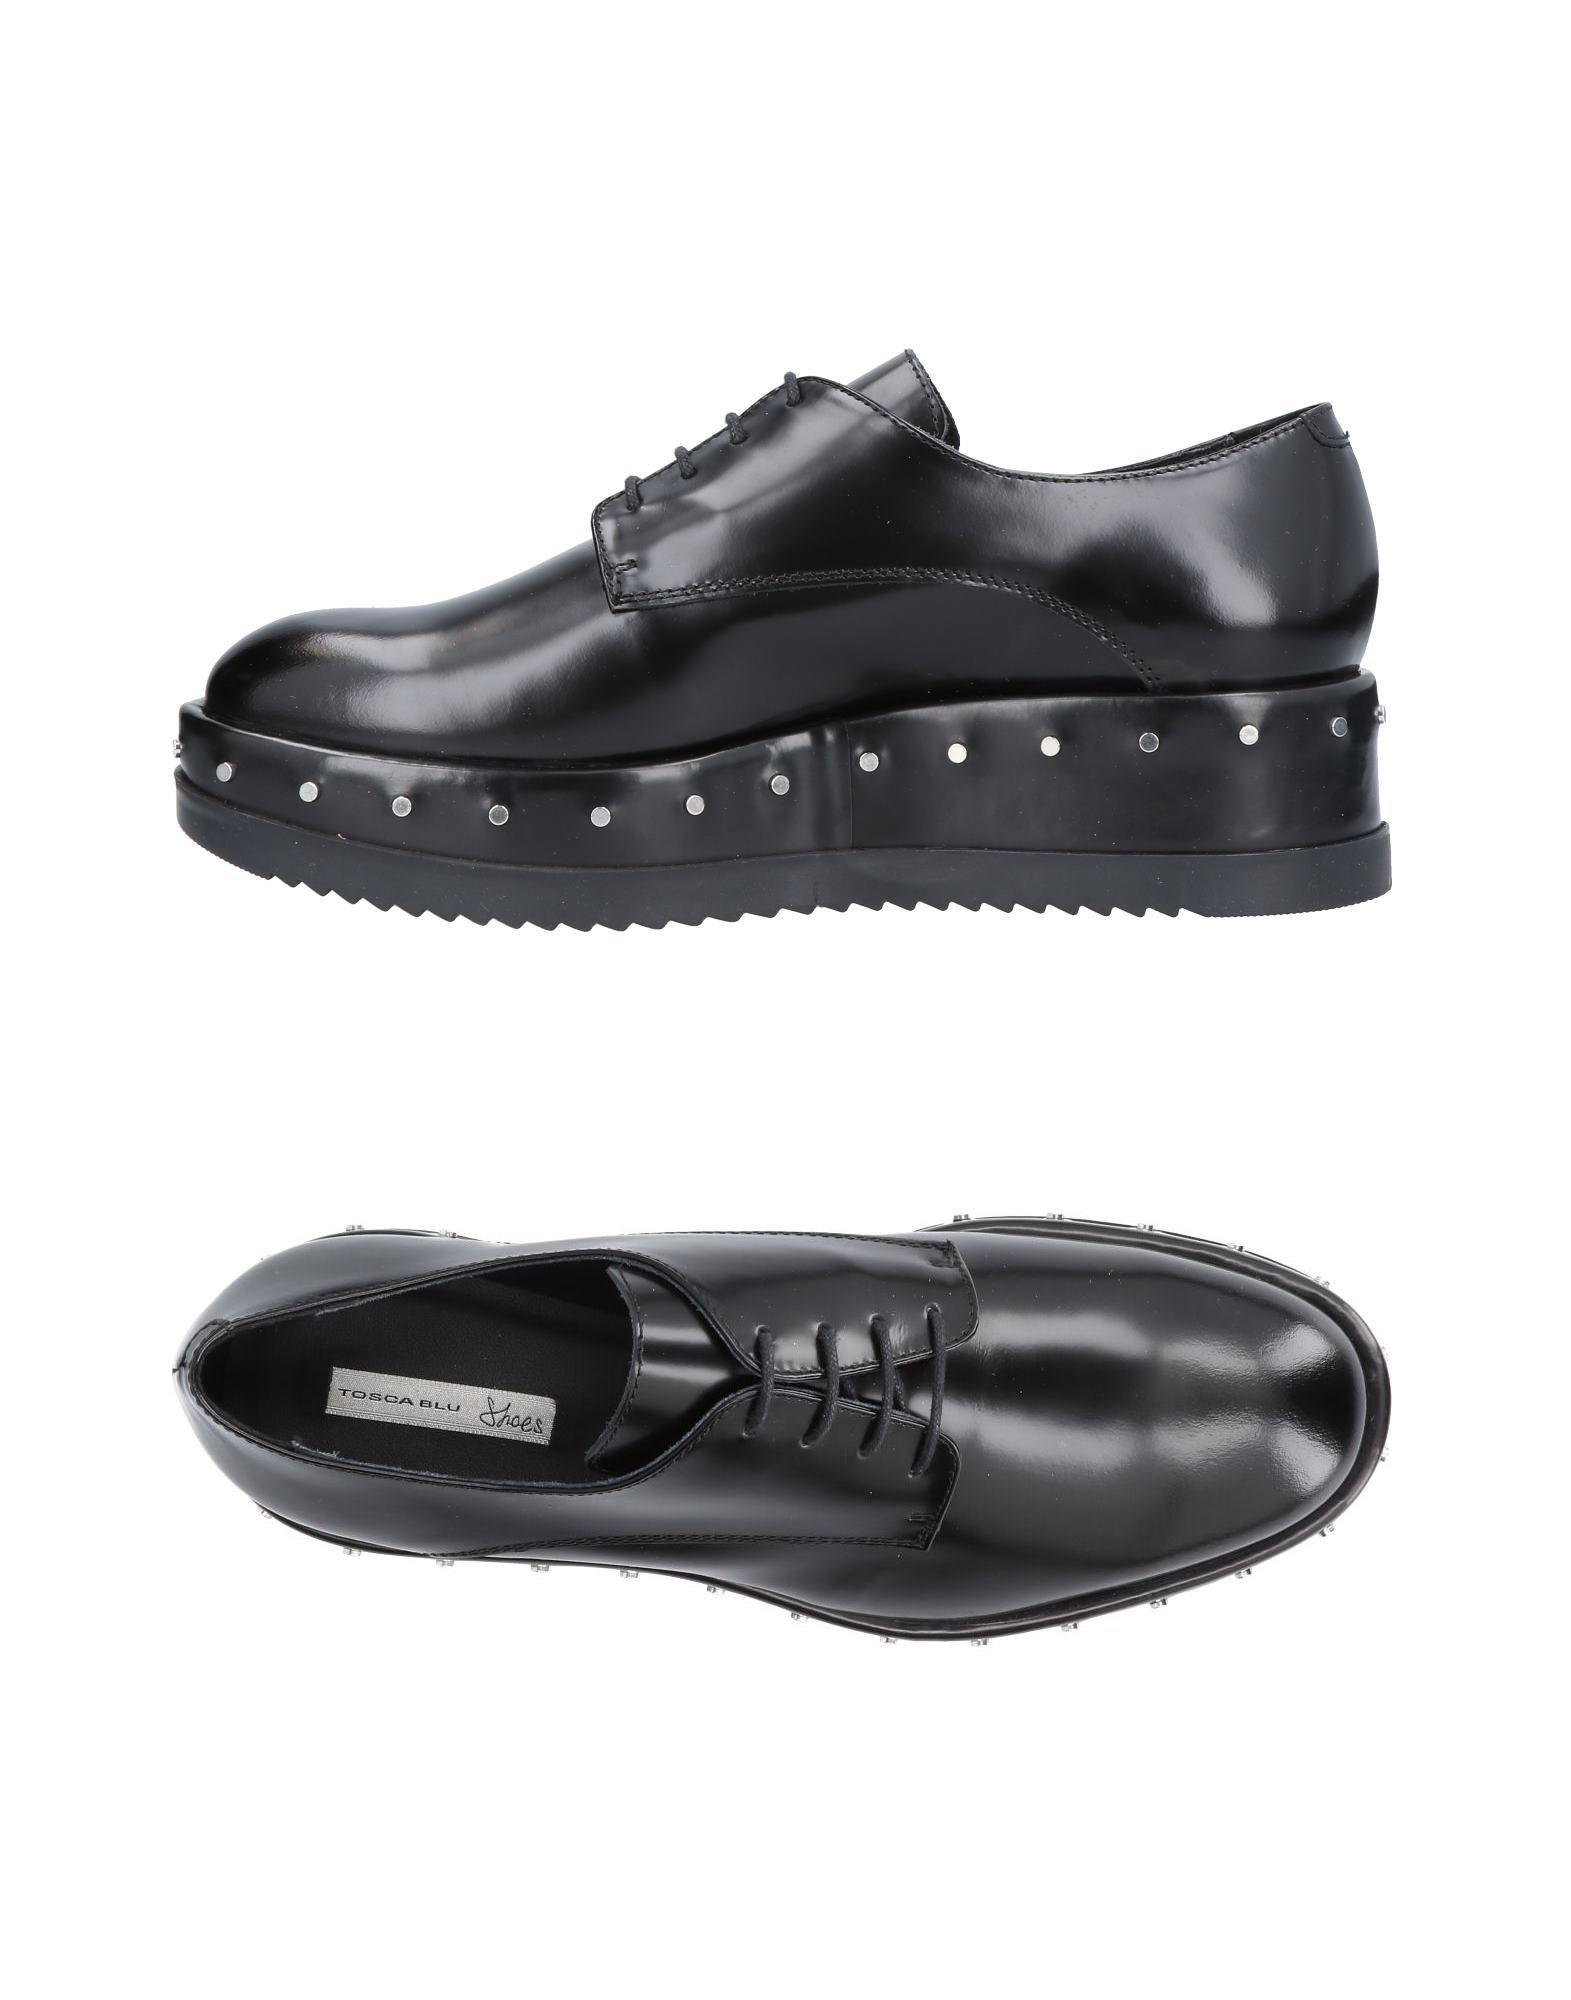 Tosca 11455331XC Blu Shoes Schnürschuhe Damen  11455331XC Tosca Gute Qualität beliebte Schuhe 3f53e1